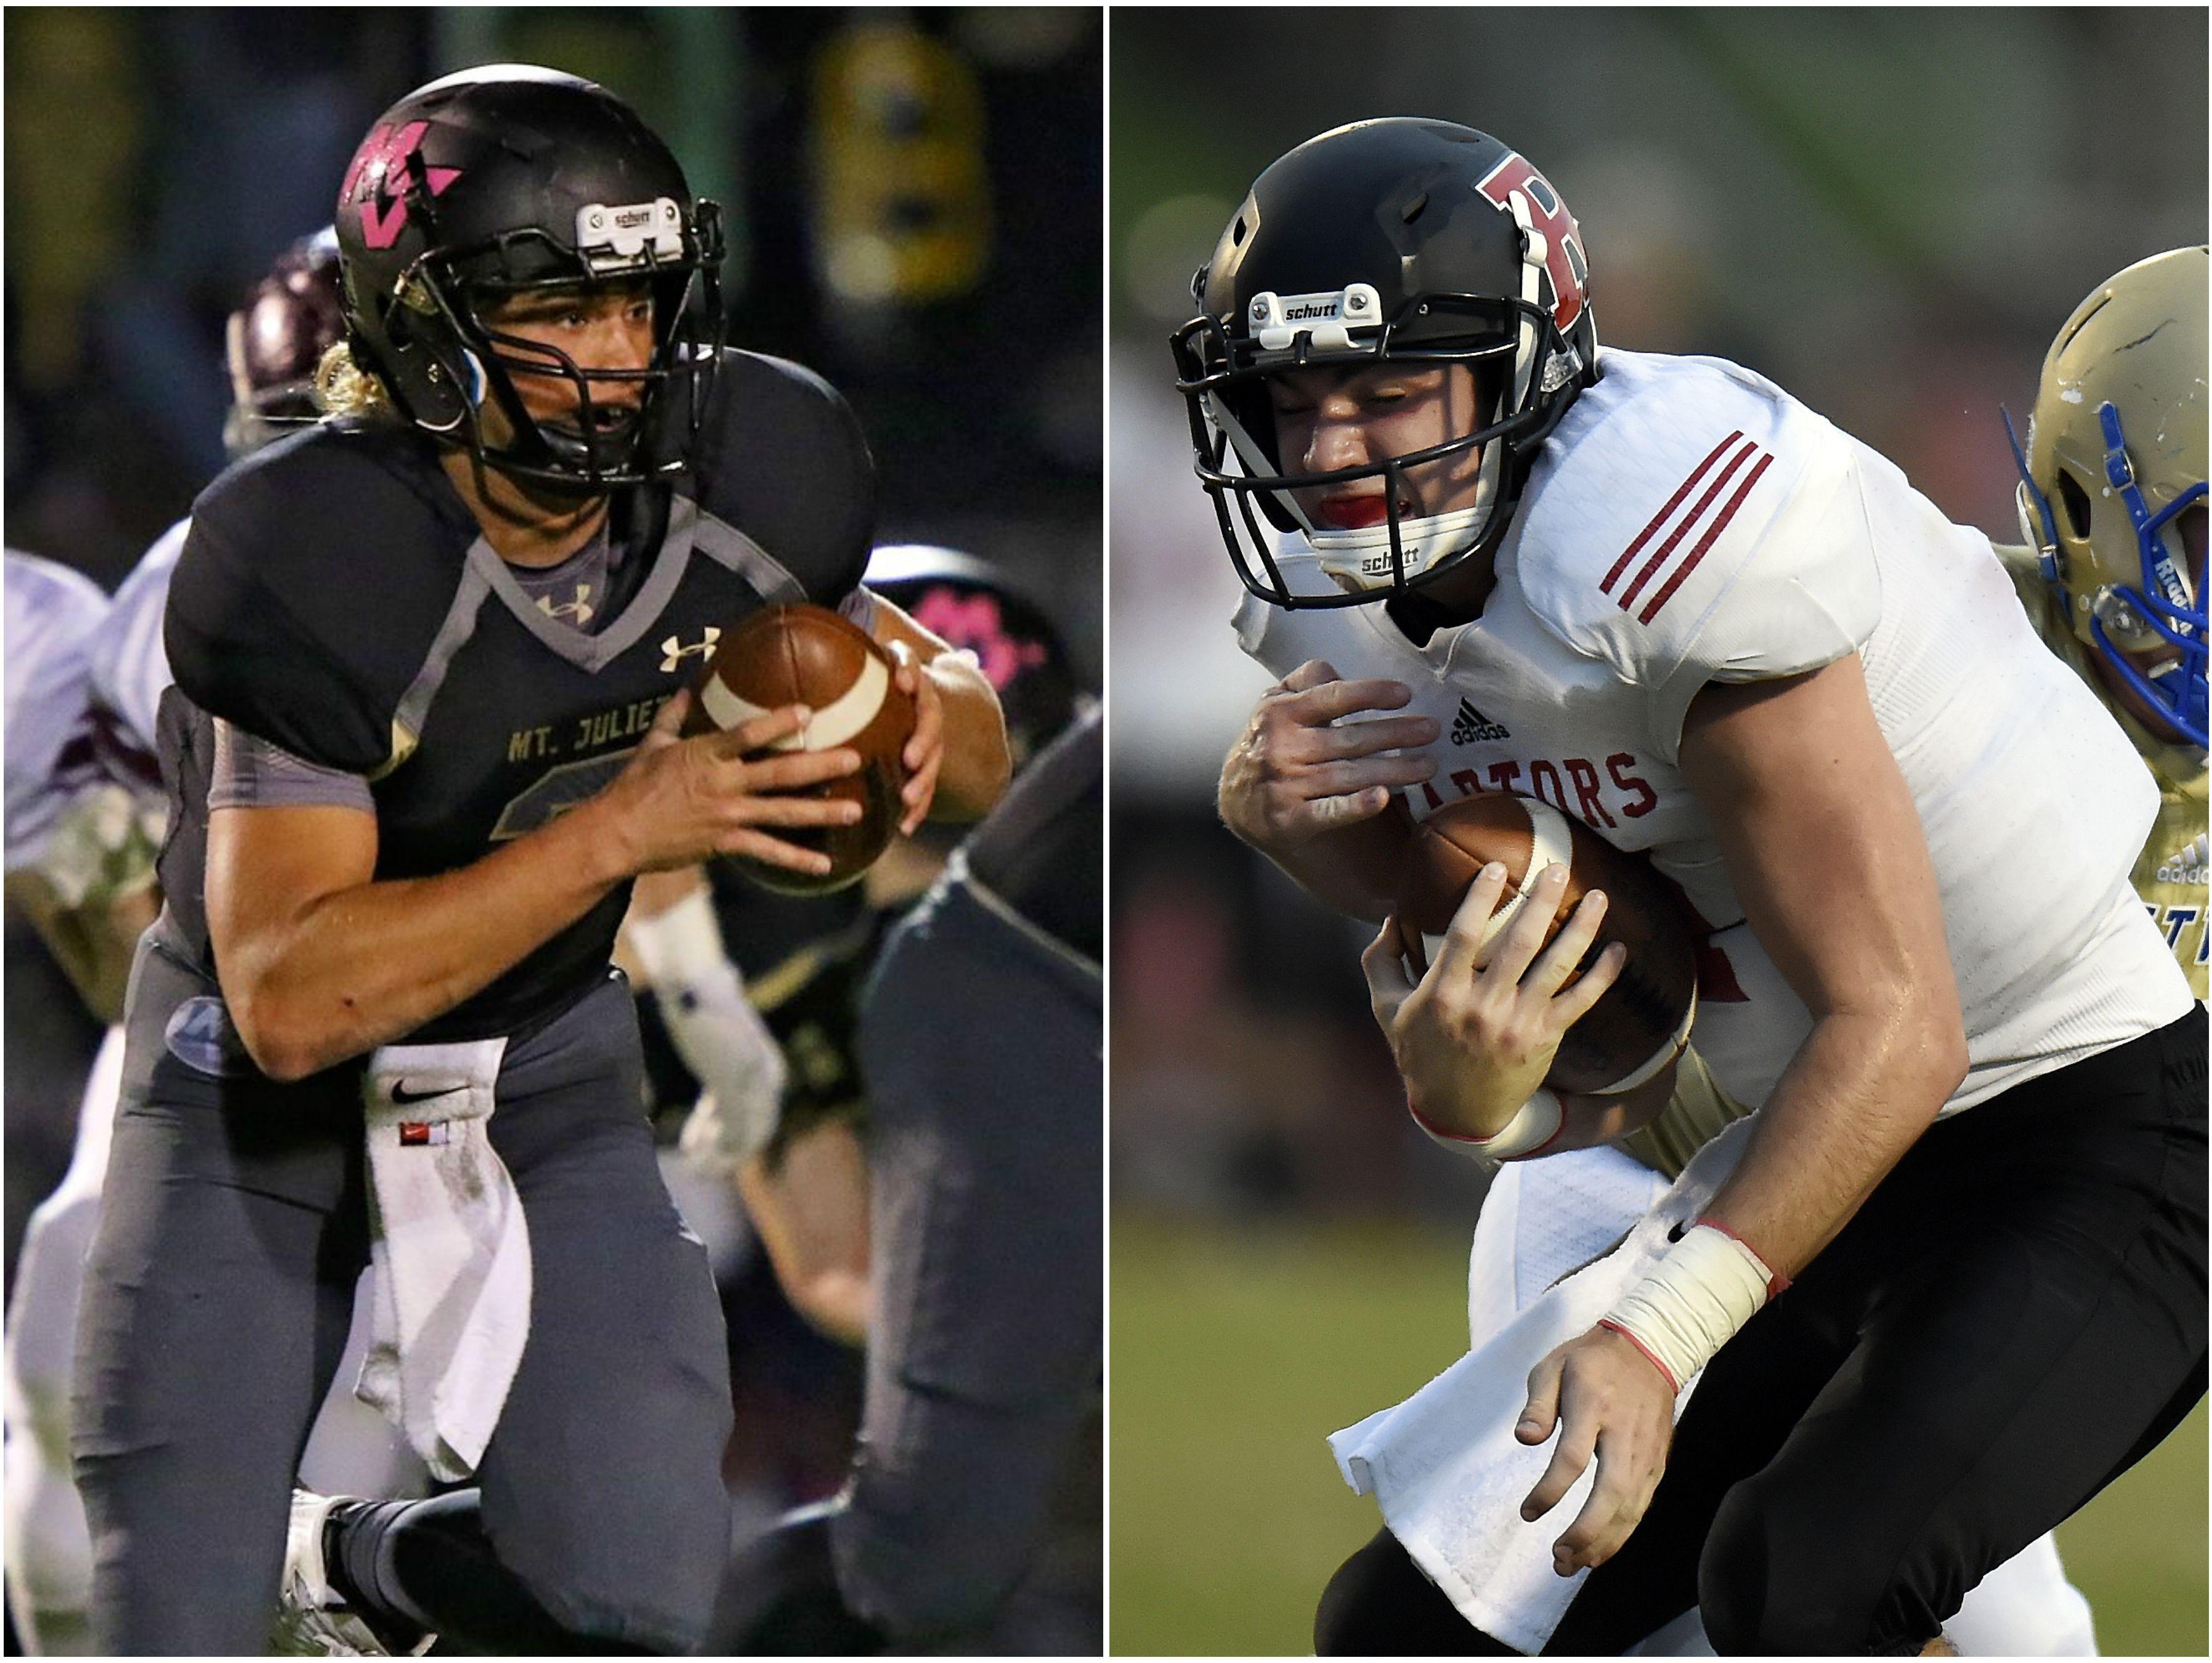 Mt. Juliet quarterback Mason Earls (left) and Ravenwood quarterback McCain Marrow (right)